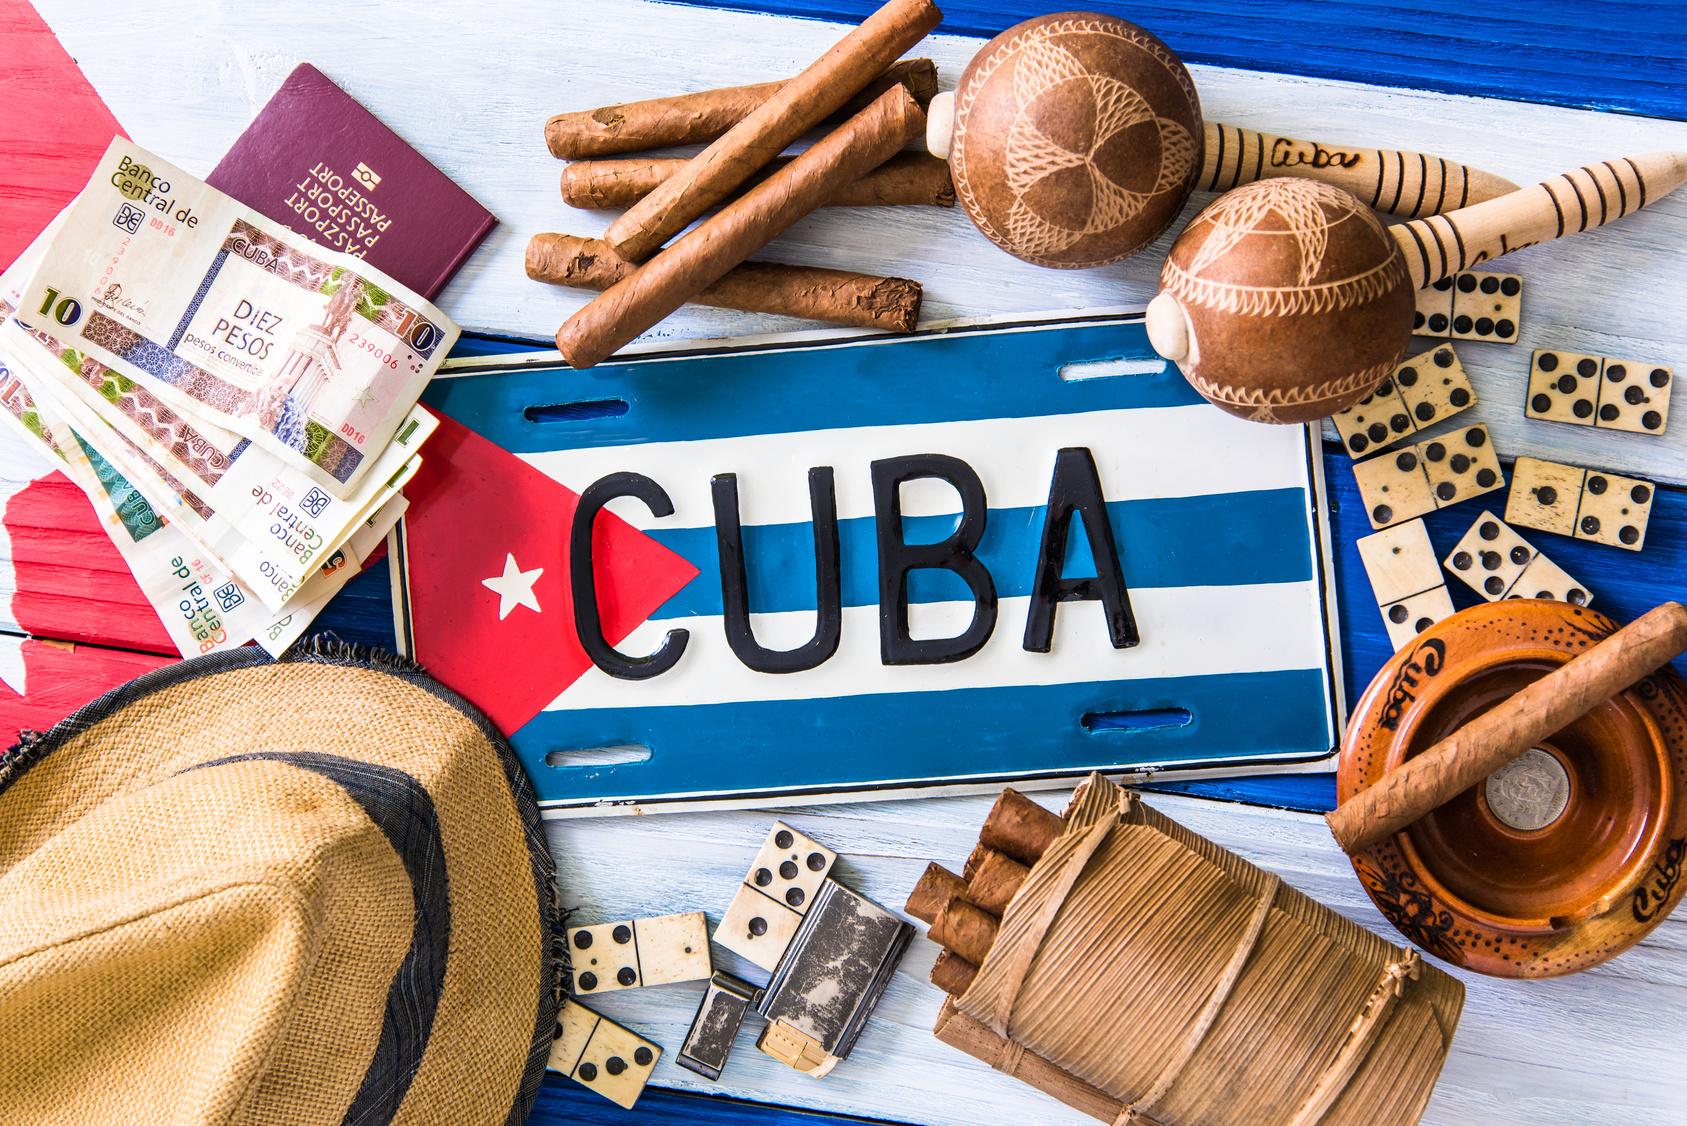 2 vacanze in 1 - Gita a Cuba dalla Florida